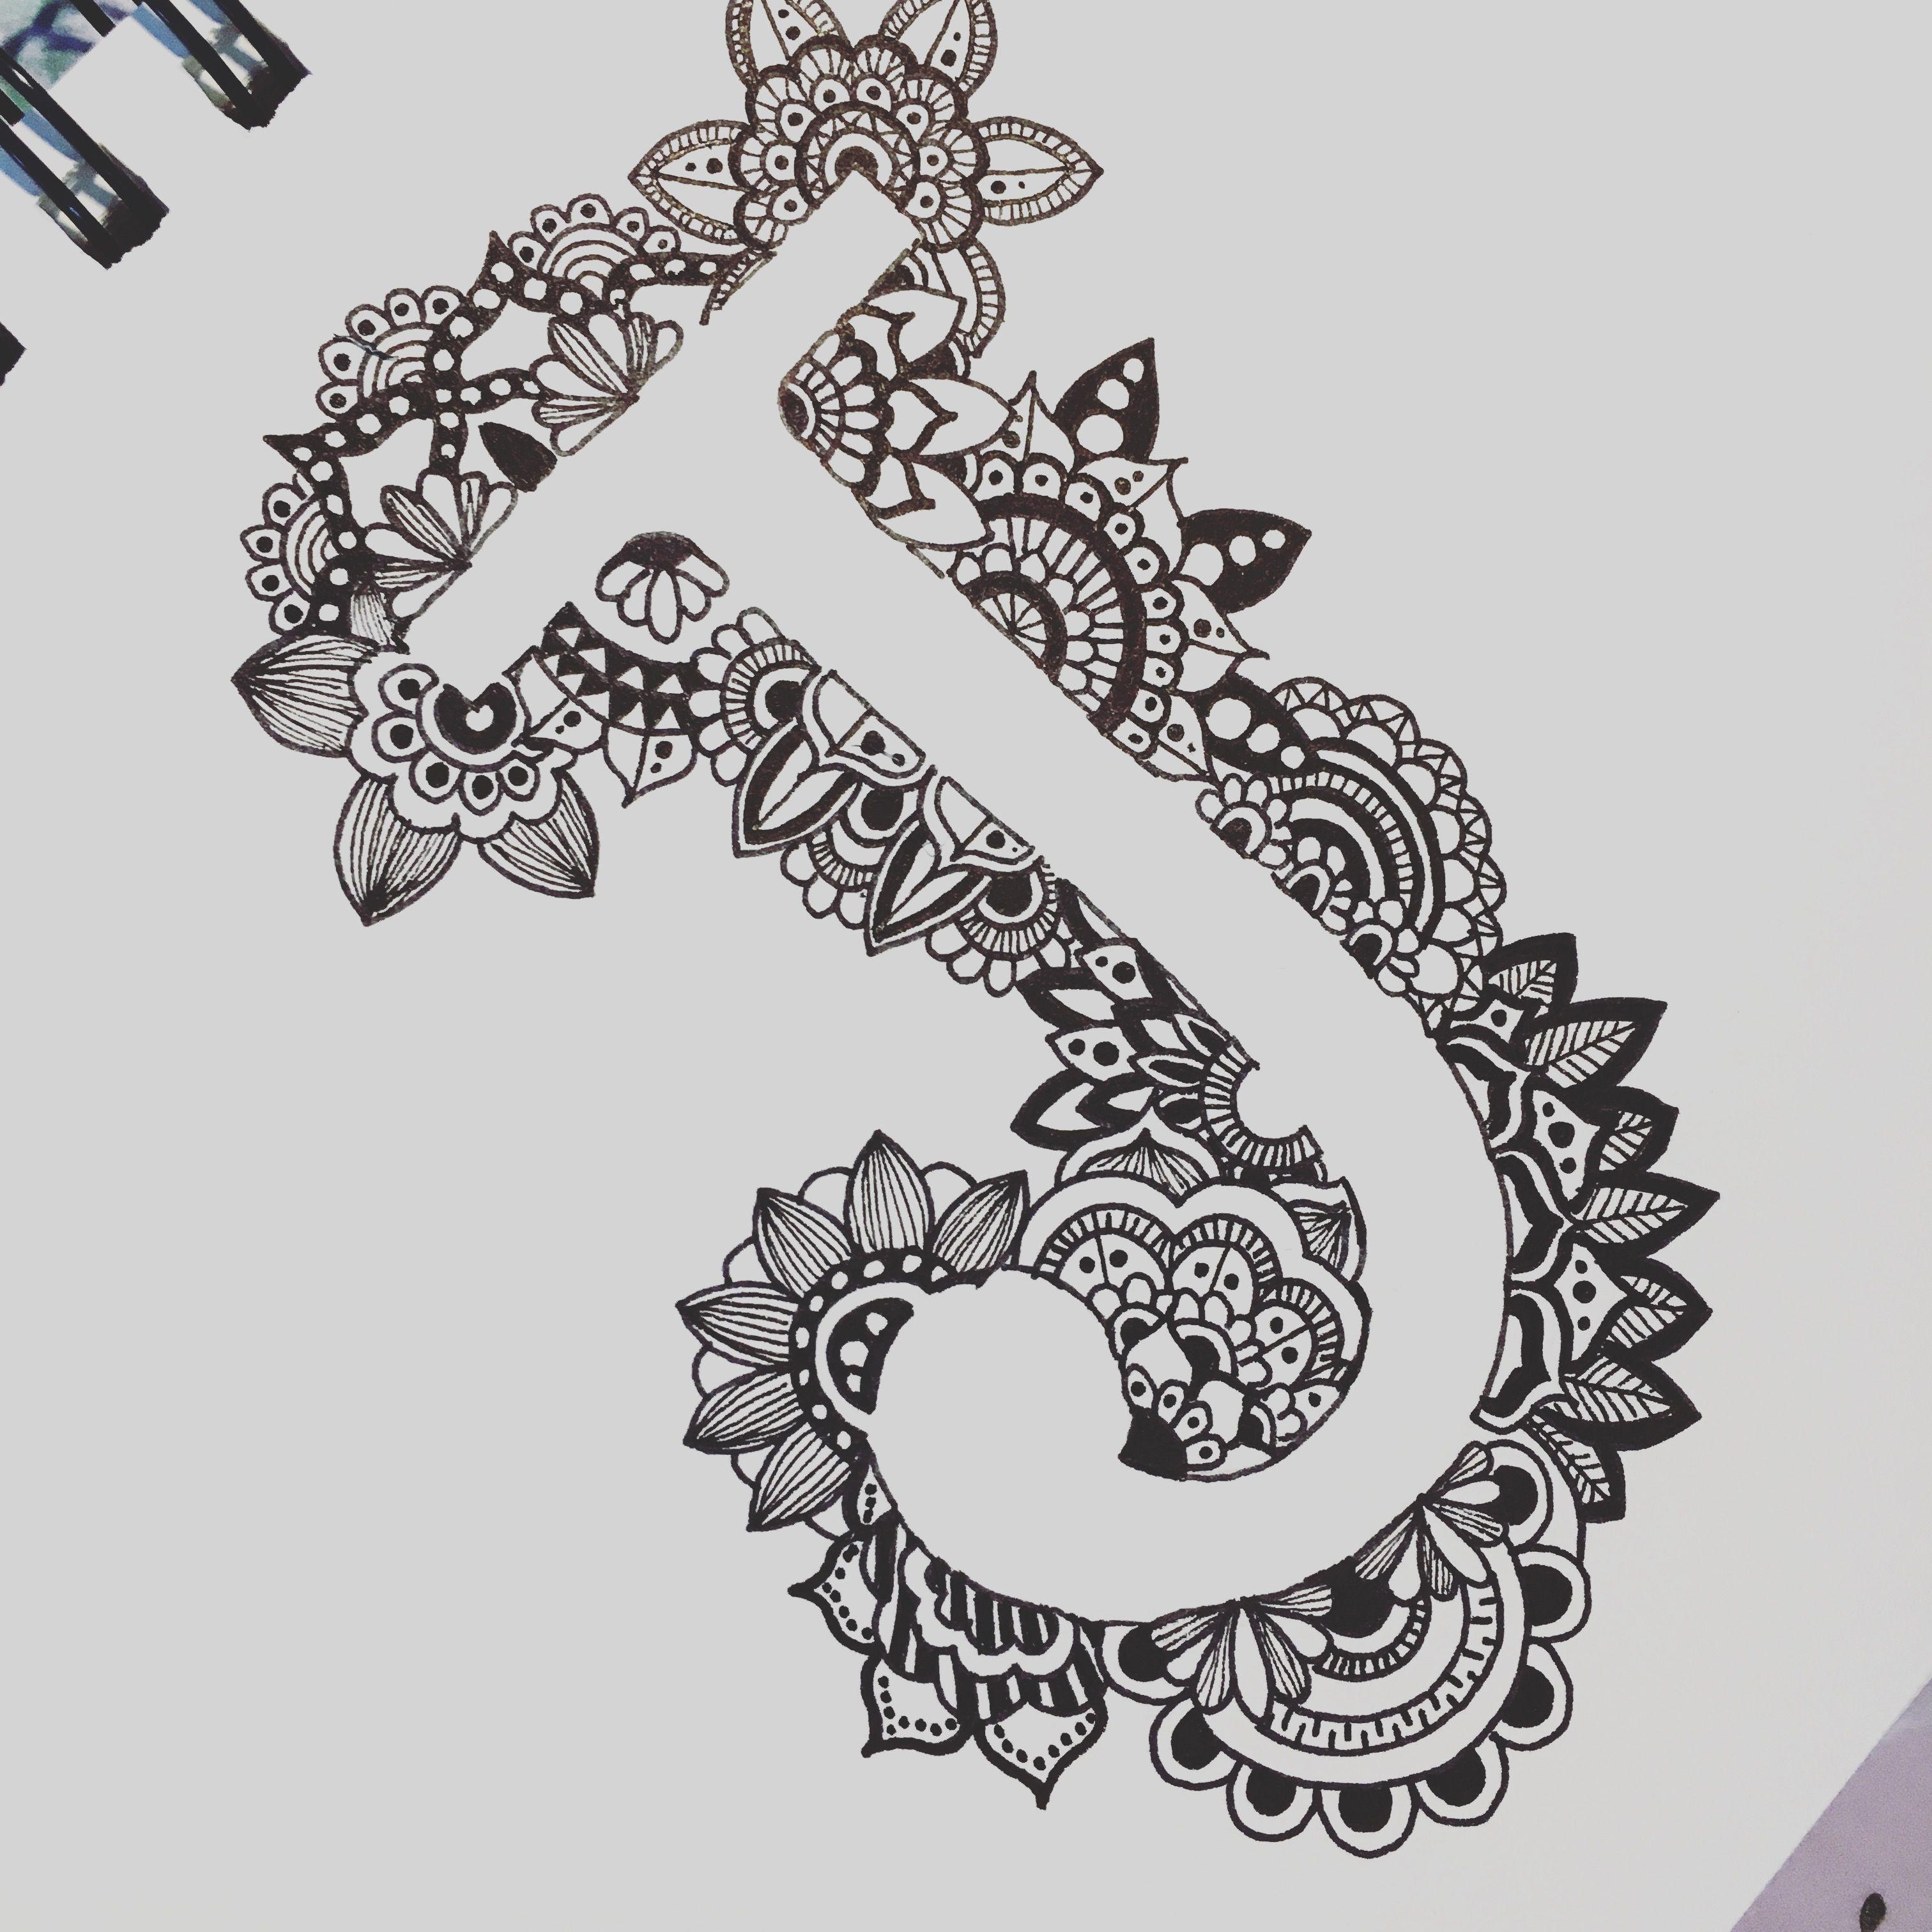 40 Beautiful Mandala Drawing Ideas Inspiration Brighter Craft Craftidea Org Doodle Art Designs Mandala Art Lesson Sharpie Art